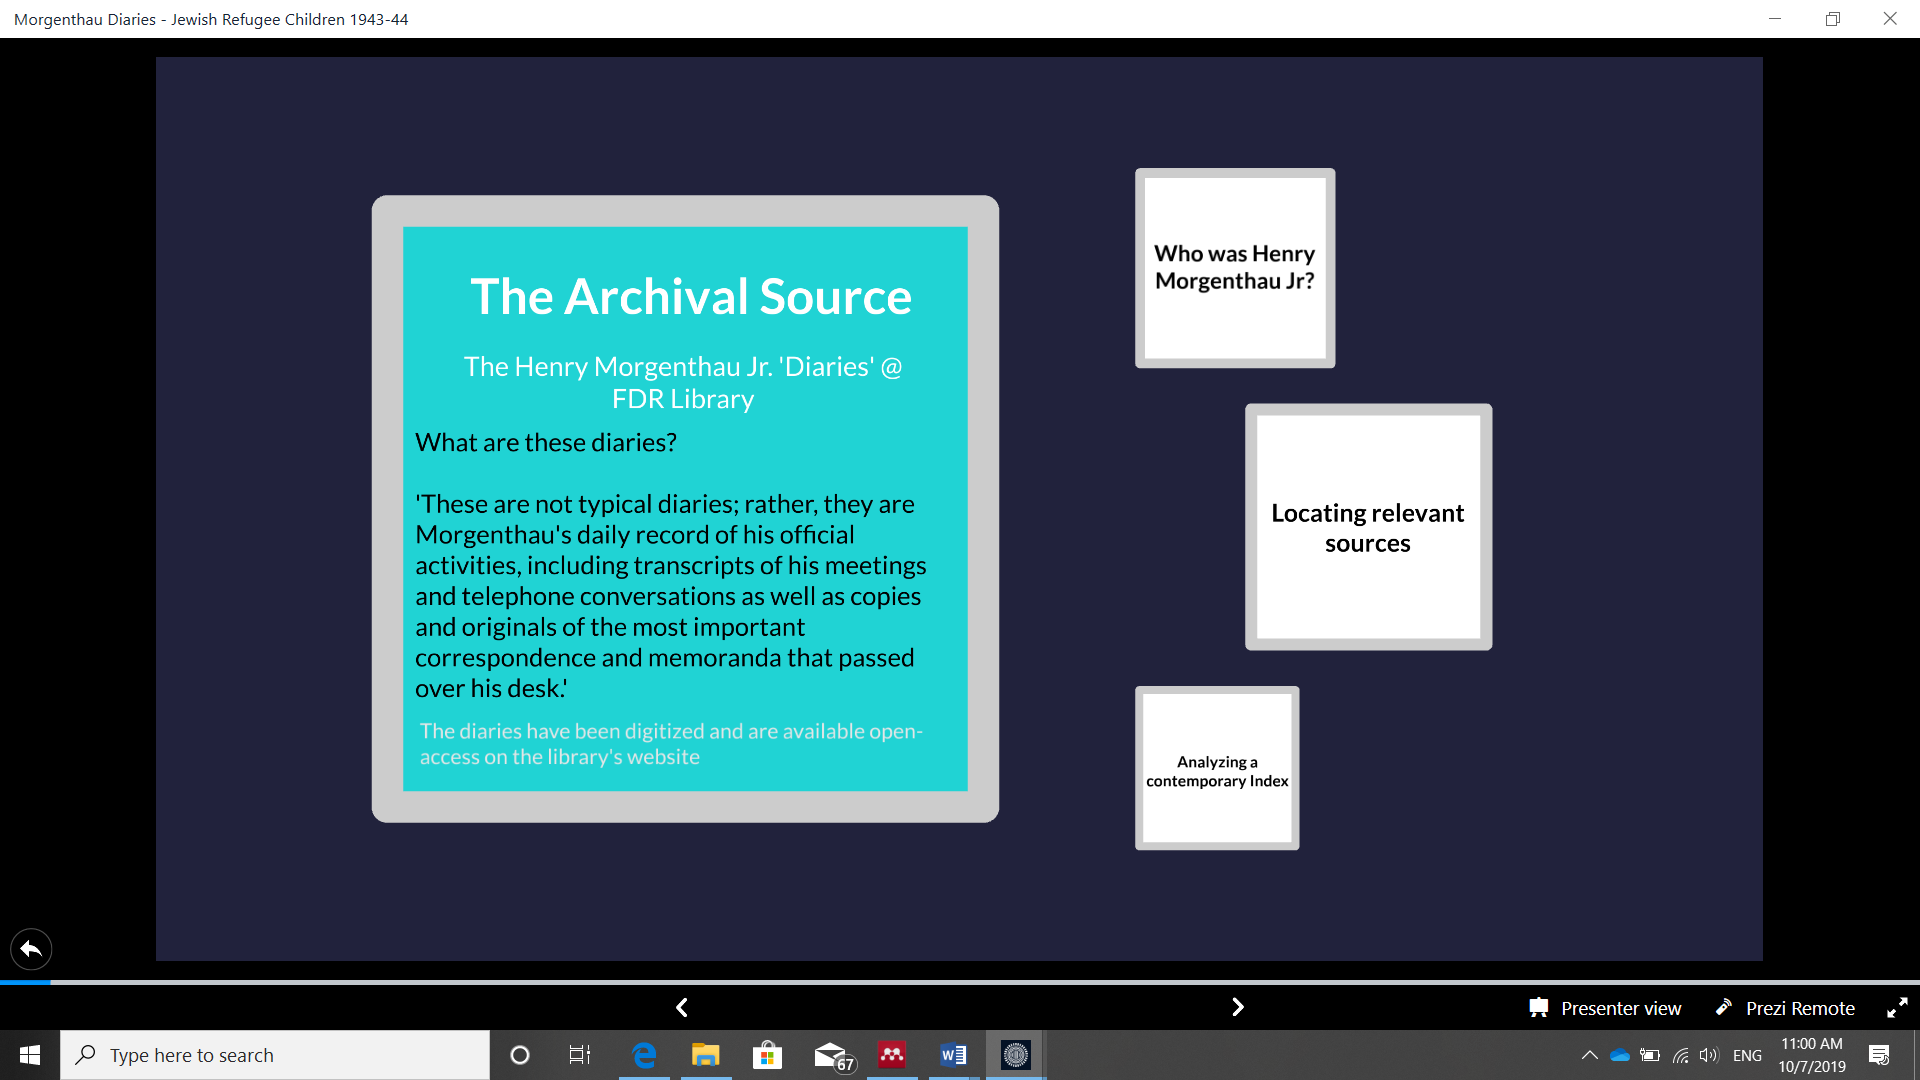 Slide 2 from EHRI presentation: description of Morgenthau Diaries